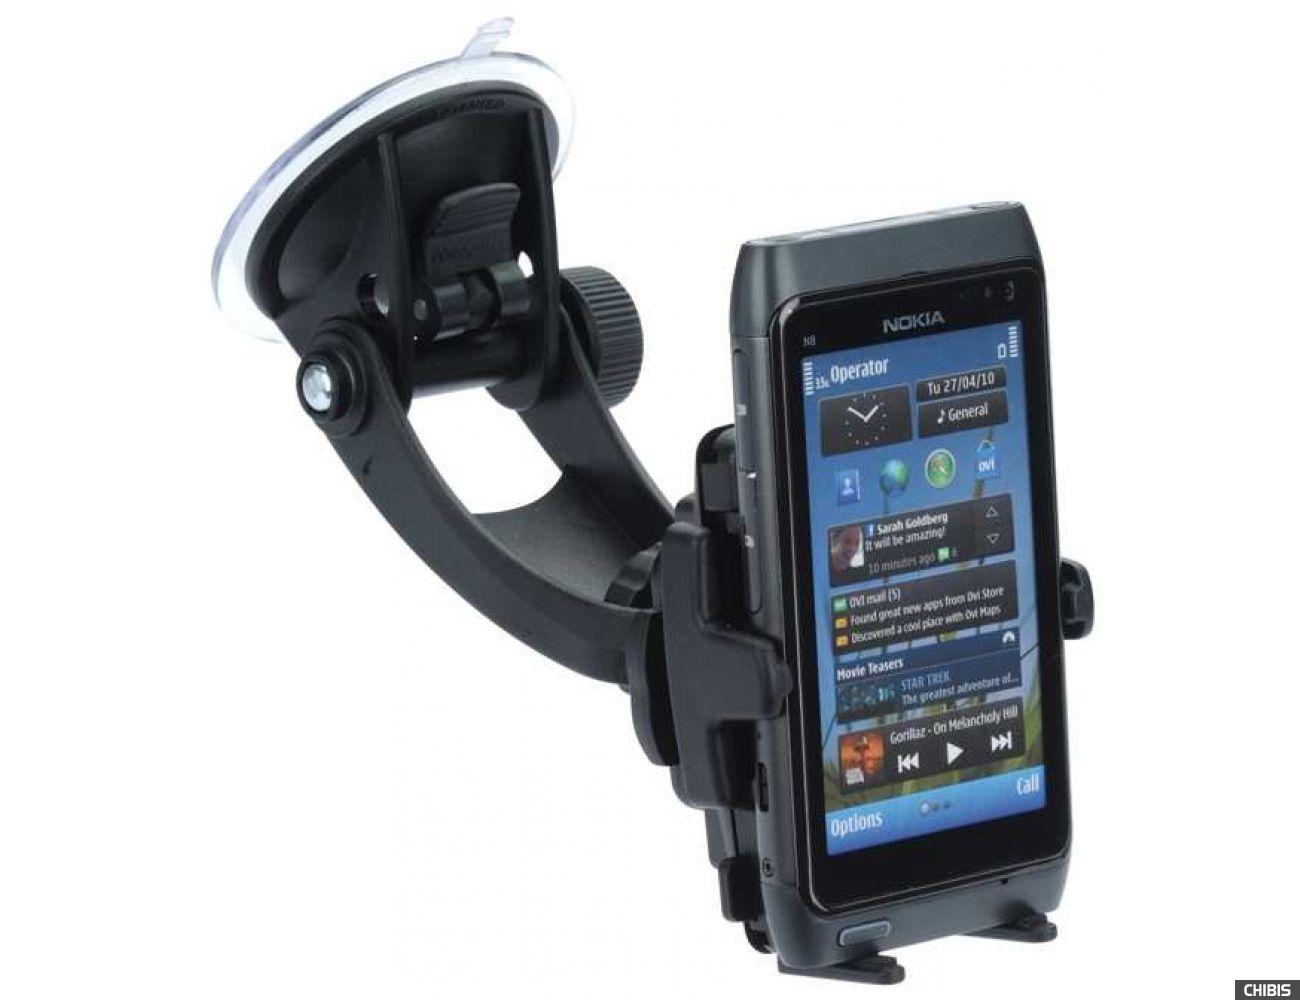 Автодержатель на стекло и торпедо iGrip Traveler 2 Kit (T5-1880) для смартфонов